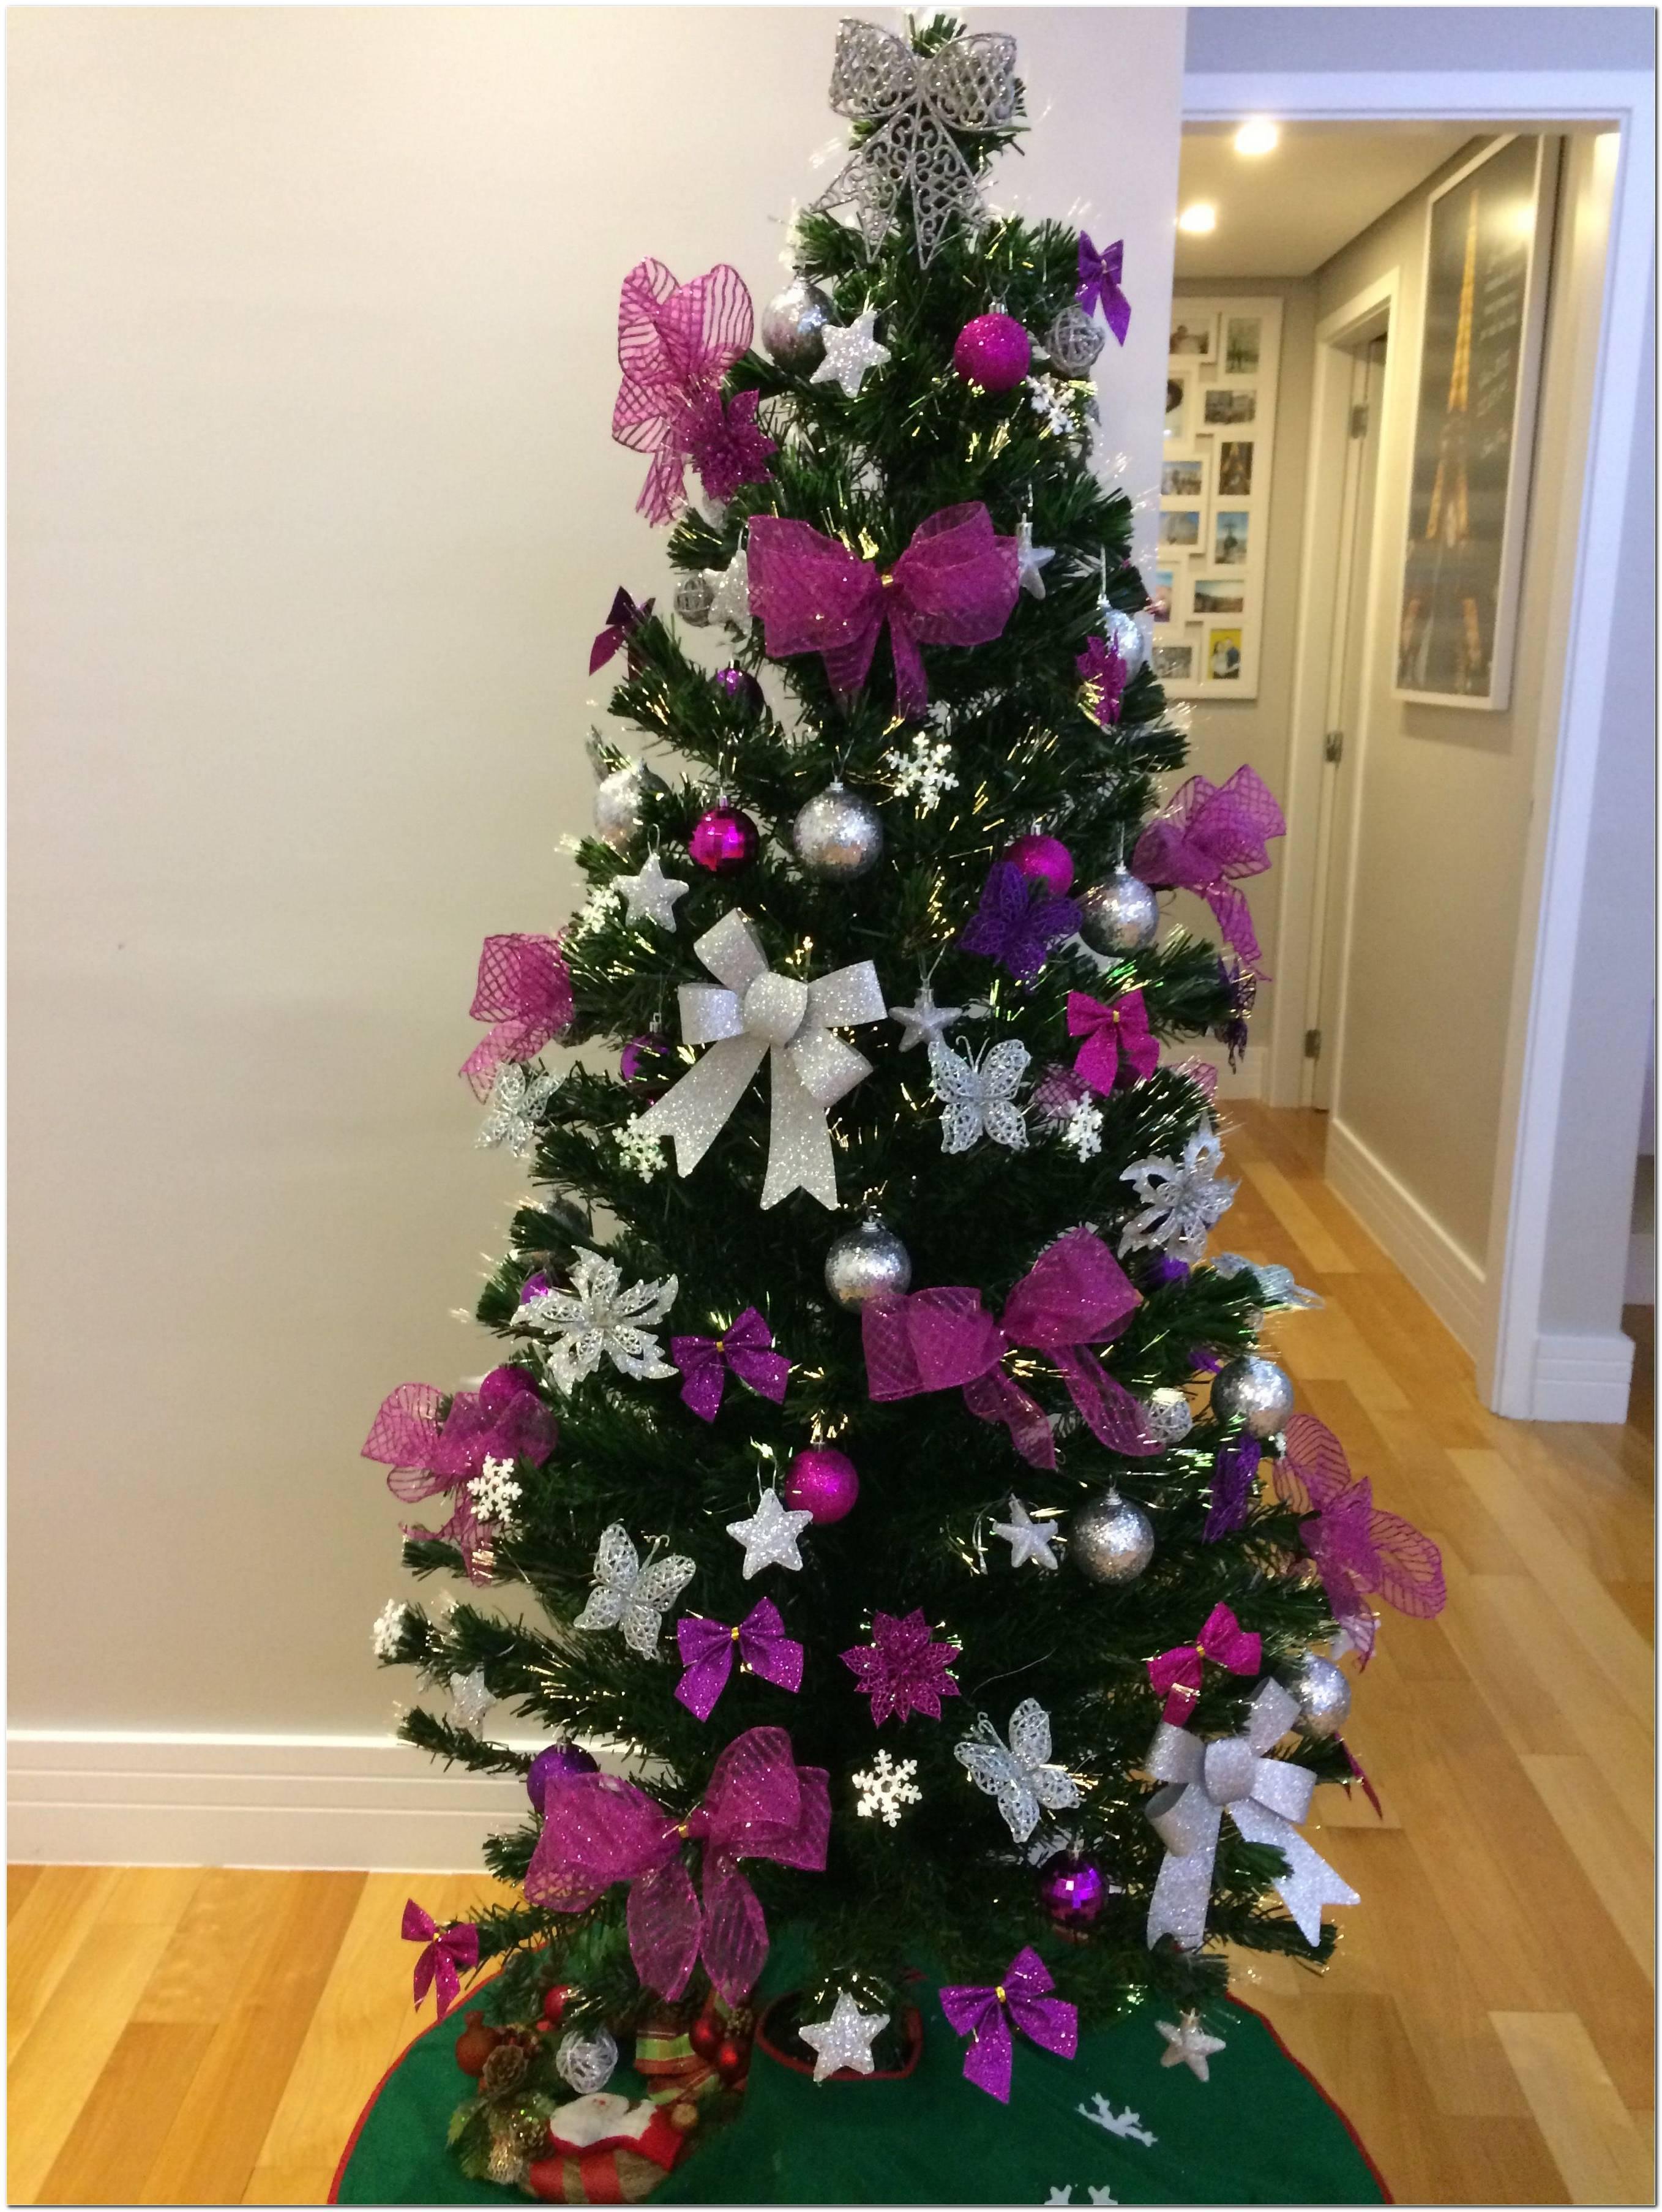 Árvore De Natal Rosa 60 Ideias Apaixonantes & Dicas Para Decorar